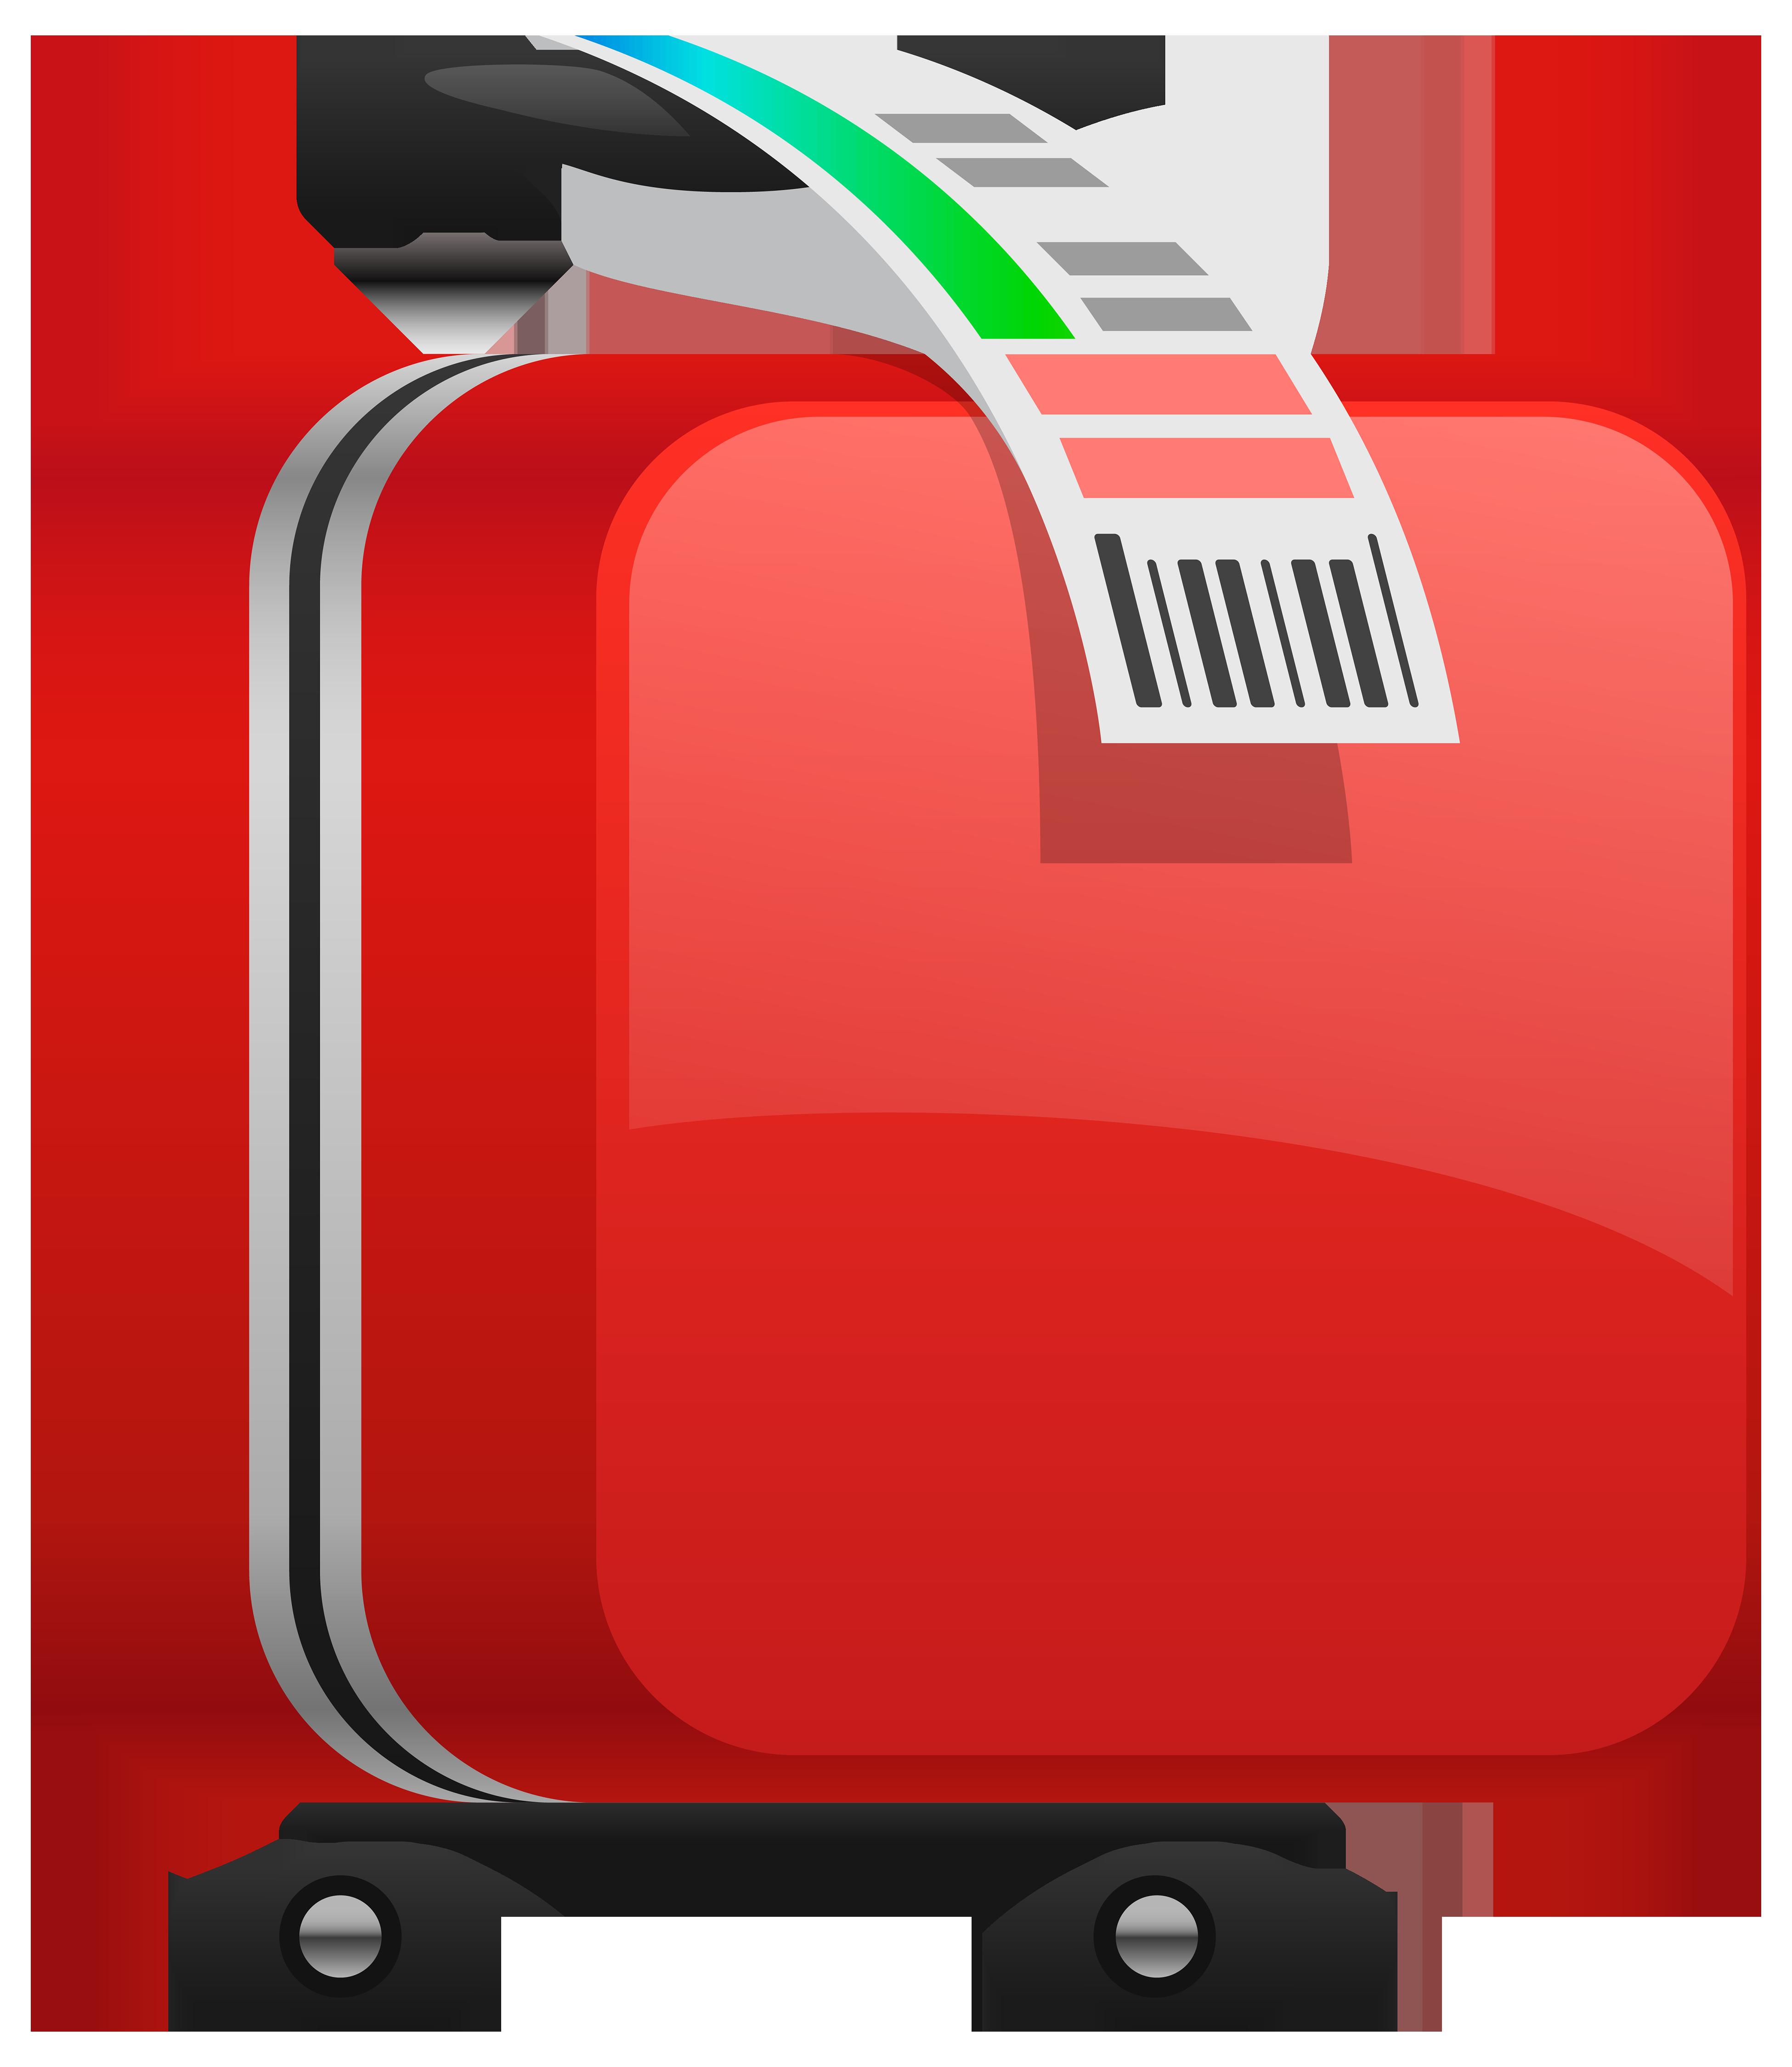 Suitcase Clip Art Transparent | Suitcase | Suitcase ...